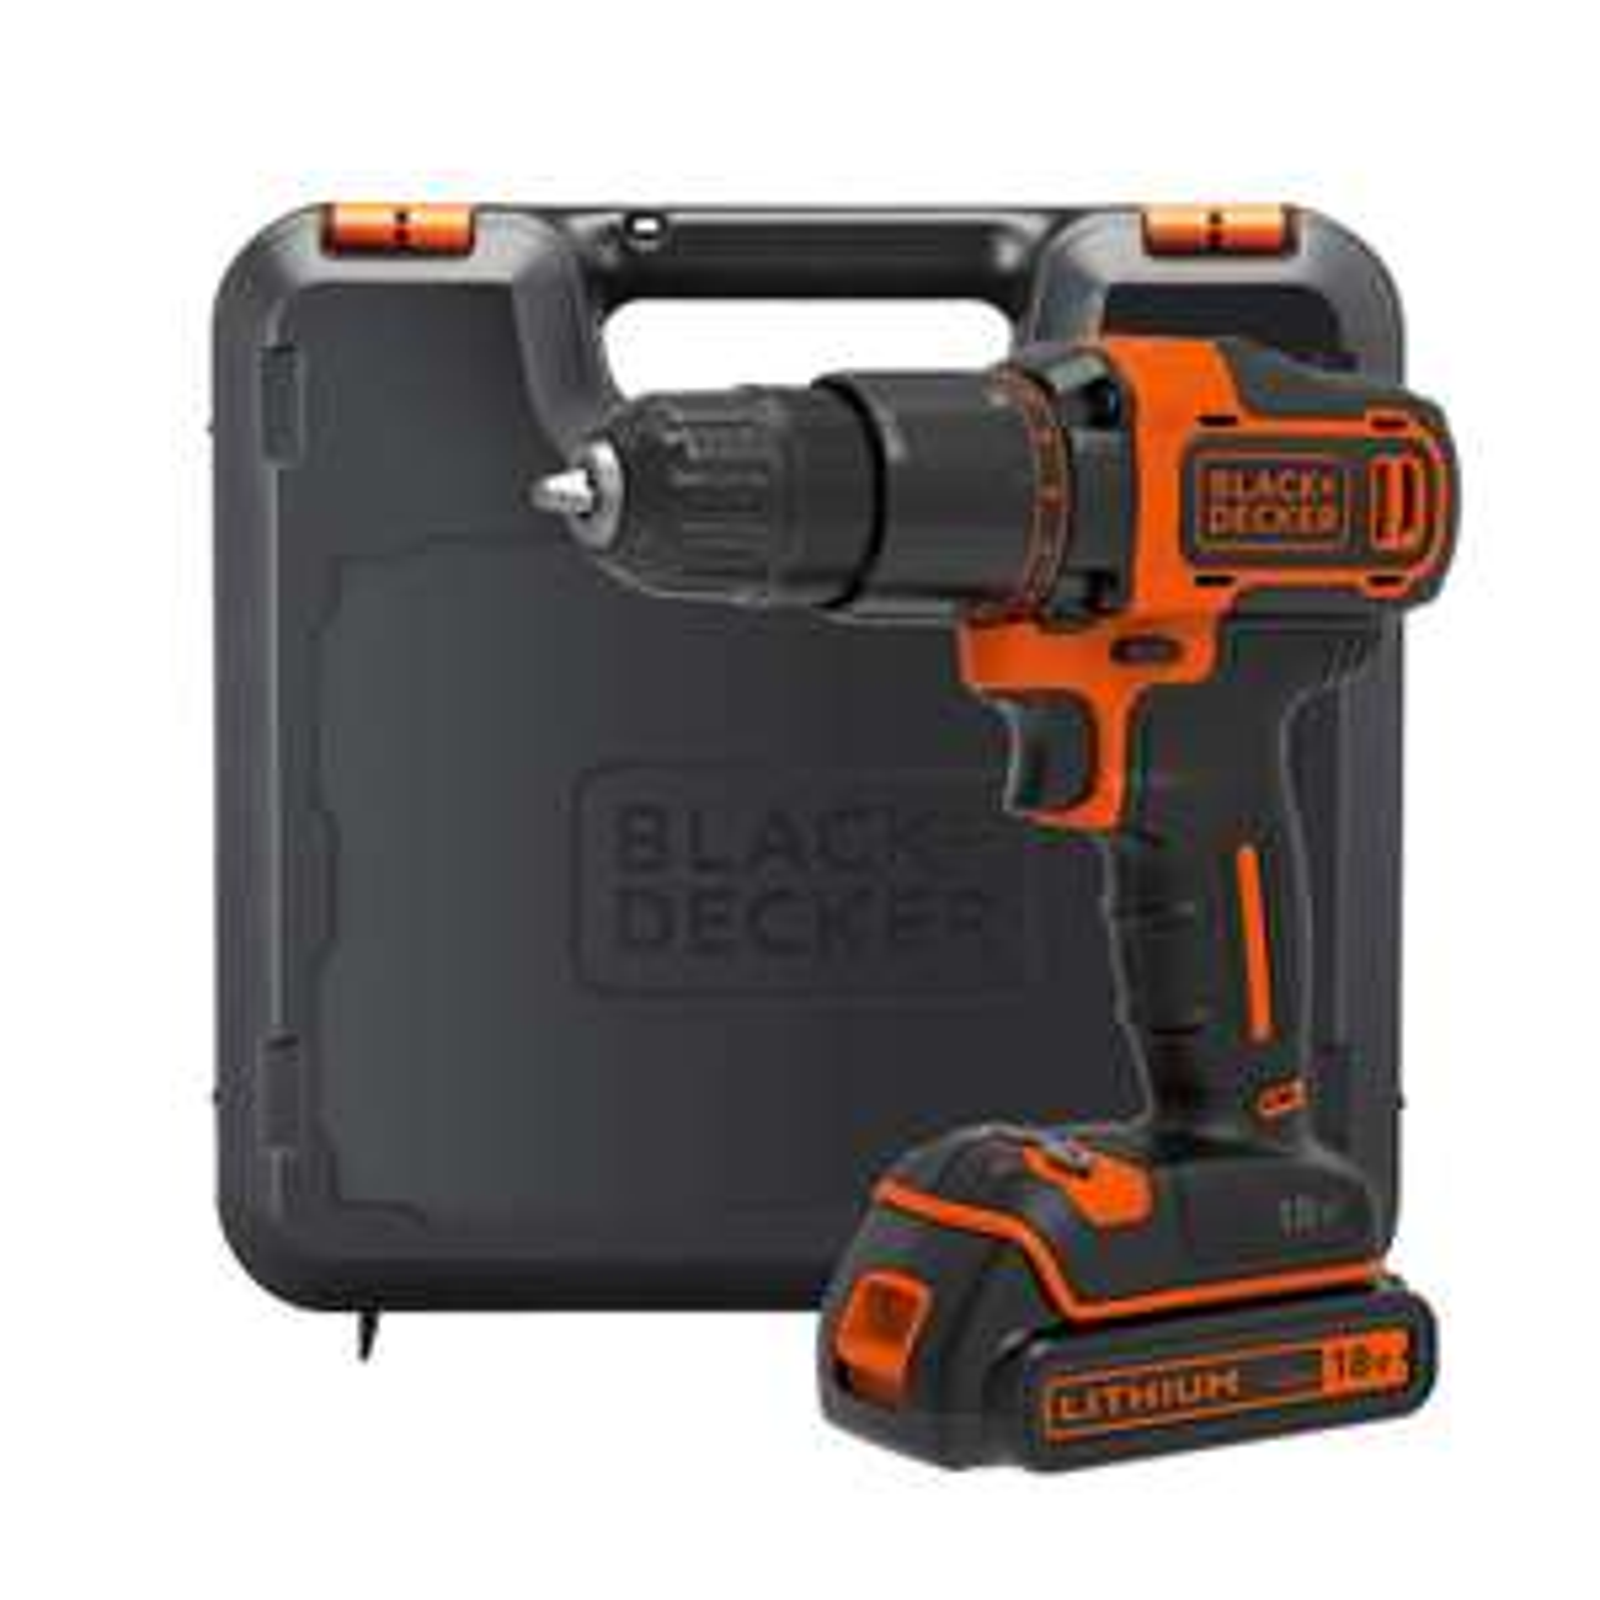 £20 off BLACK+DECKER 18V Cordless 2 Gear Hammer Drill with Kitbox BCD700S1K-GB £45 at Homebase